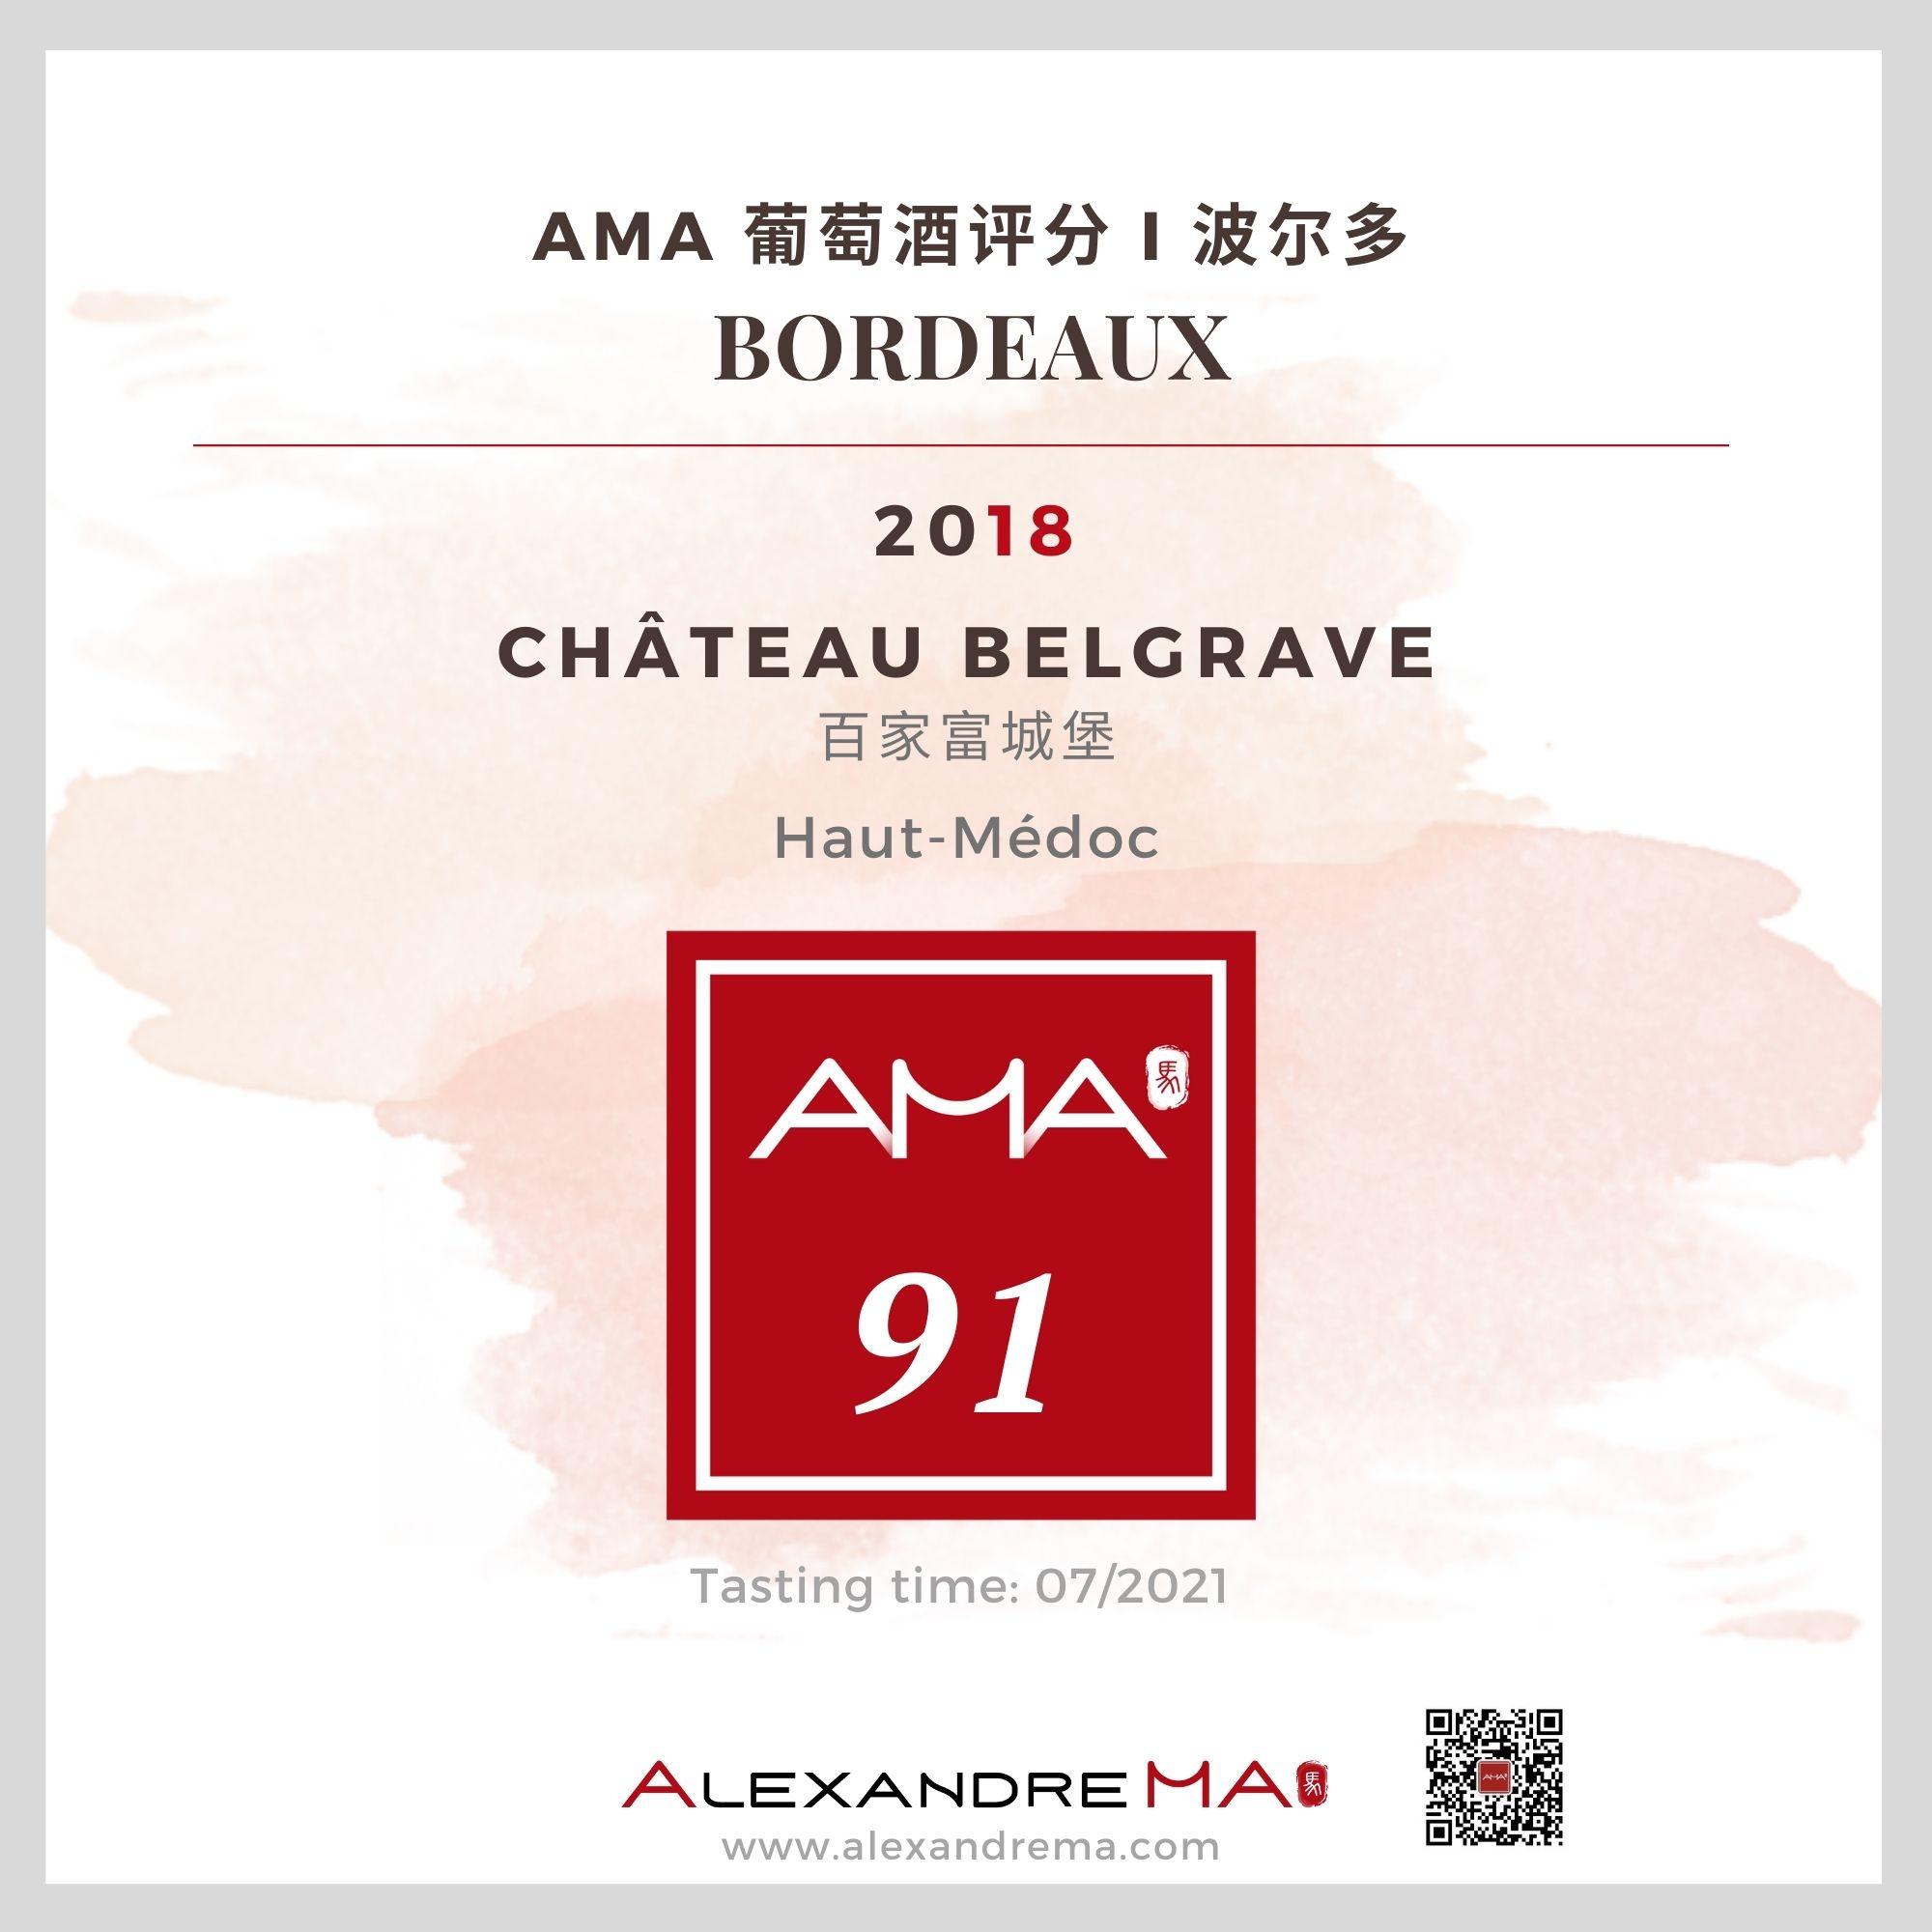 Château Belgrave 2018 百家富城堡 - Alexandre Ma